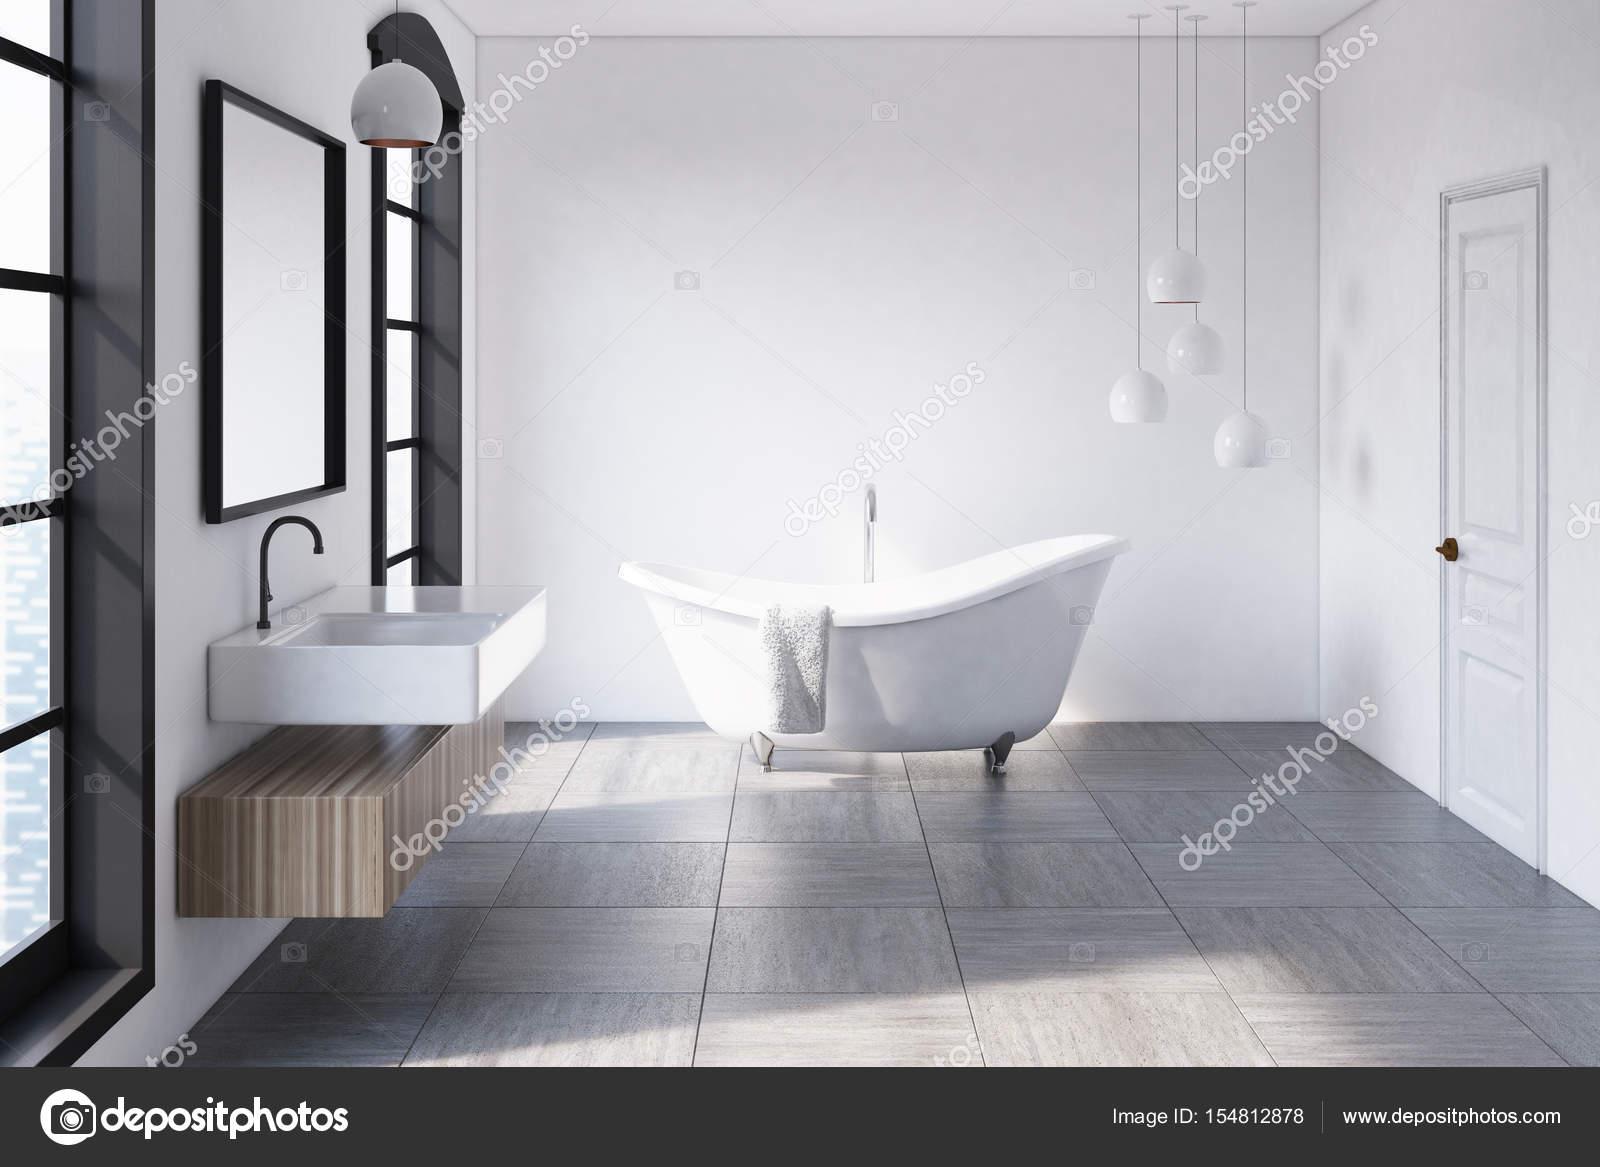 https://st3.depositphotos.com/2673929/15481/i/1600/depositphotos_154812878-stockafbeelding-witte-badkamer-lampen.jpg